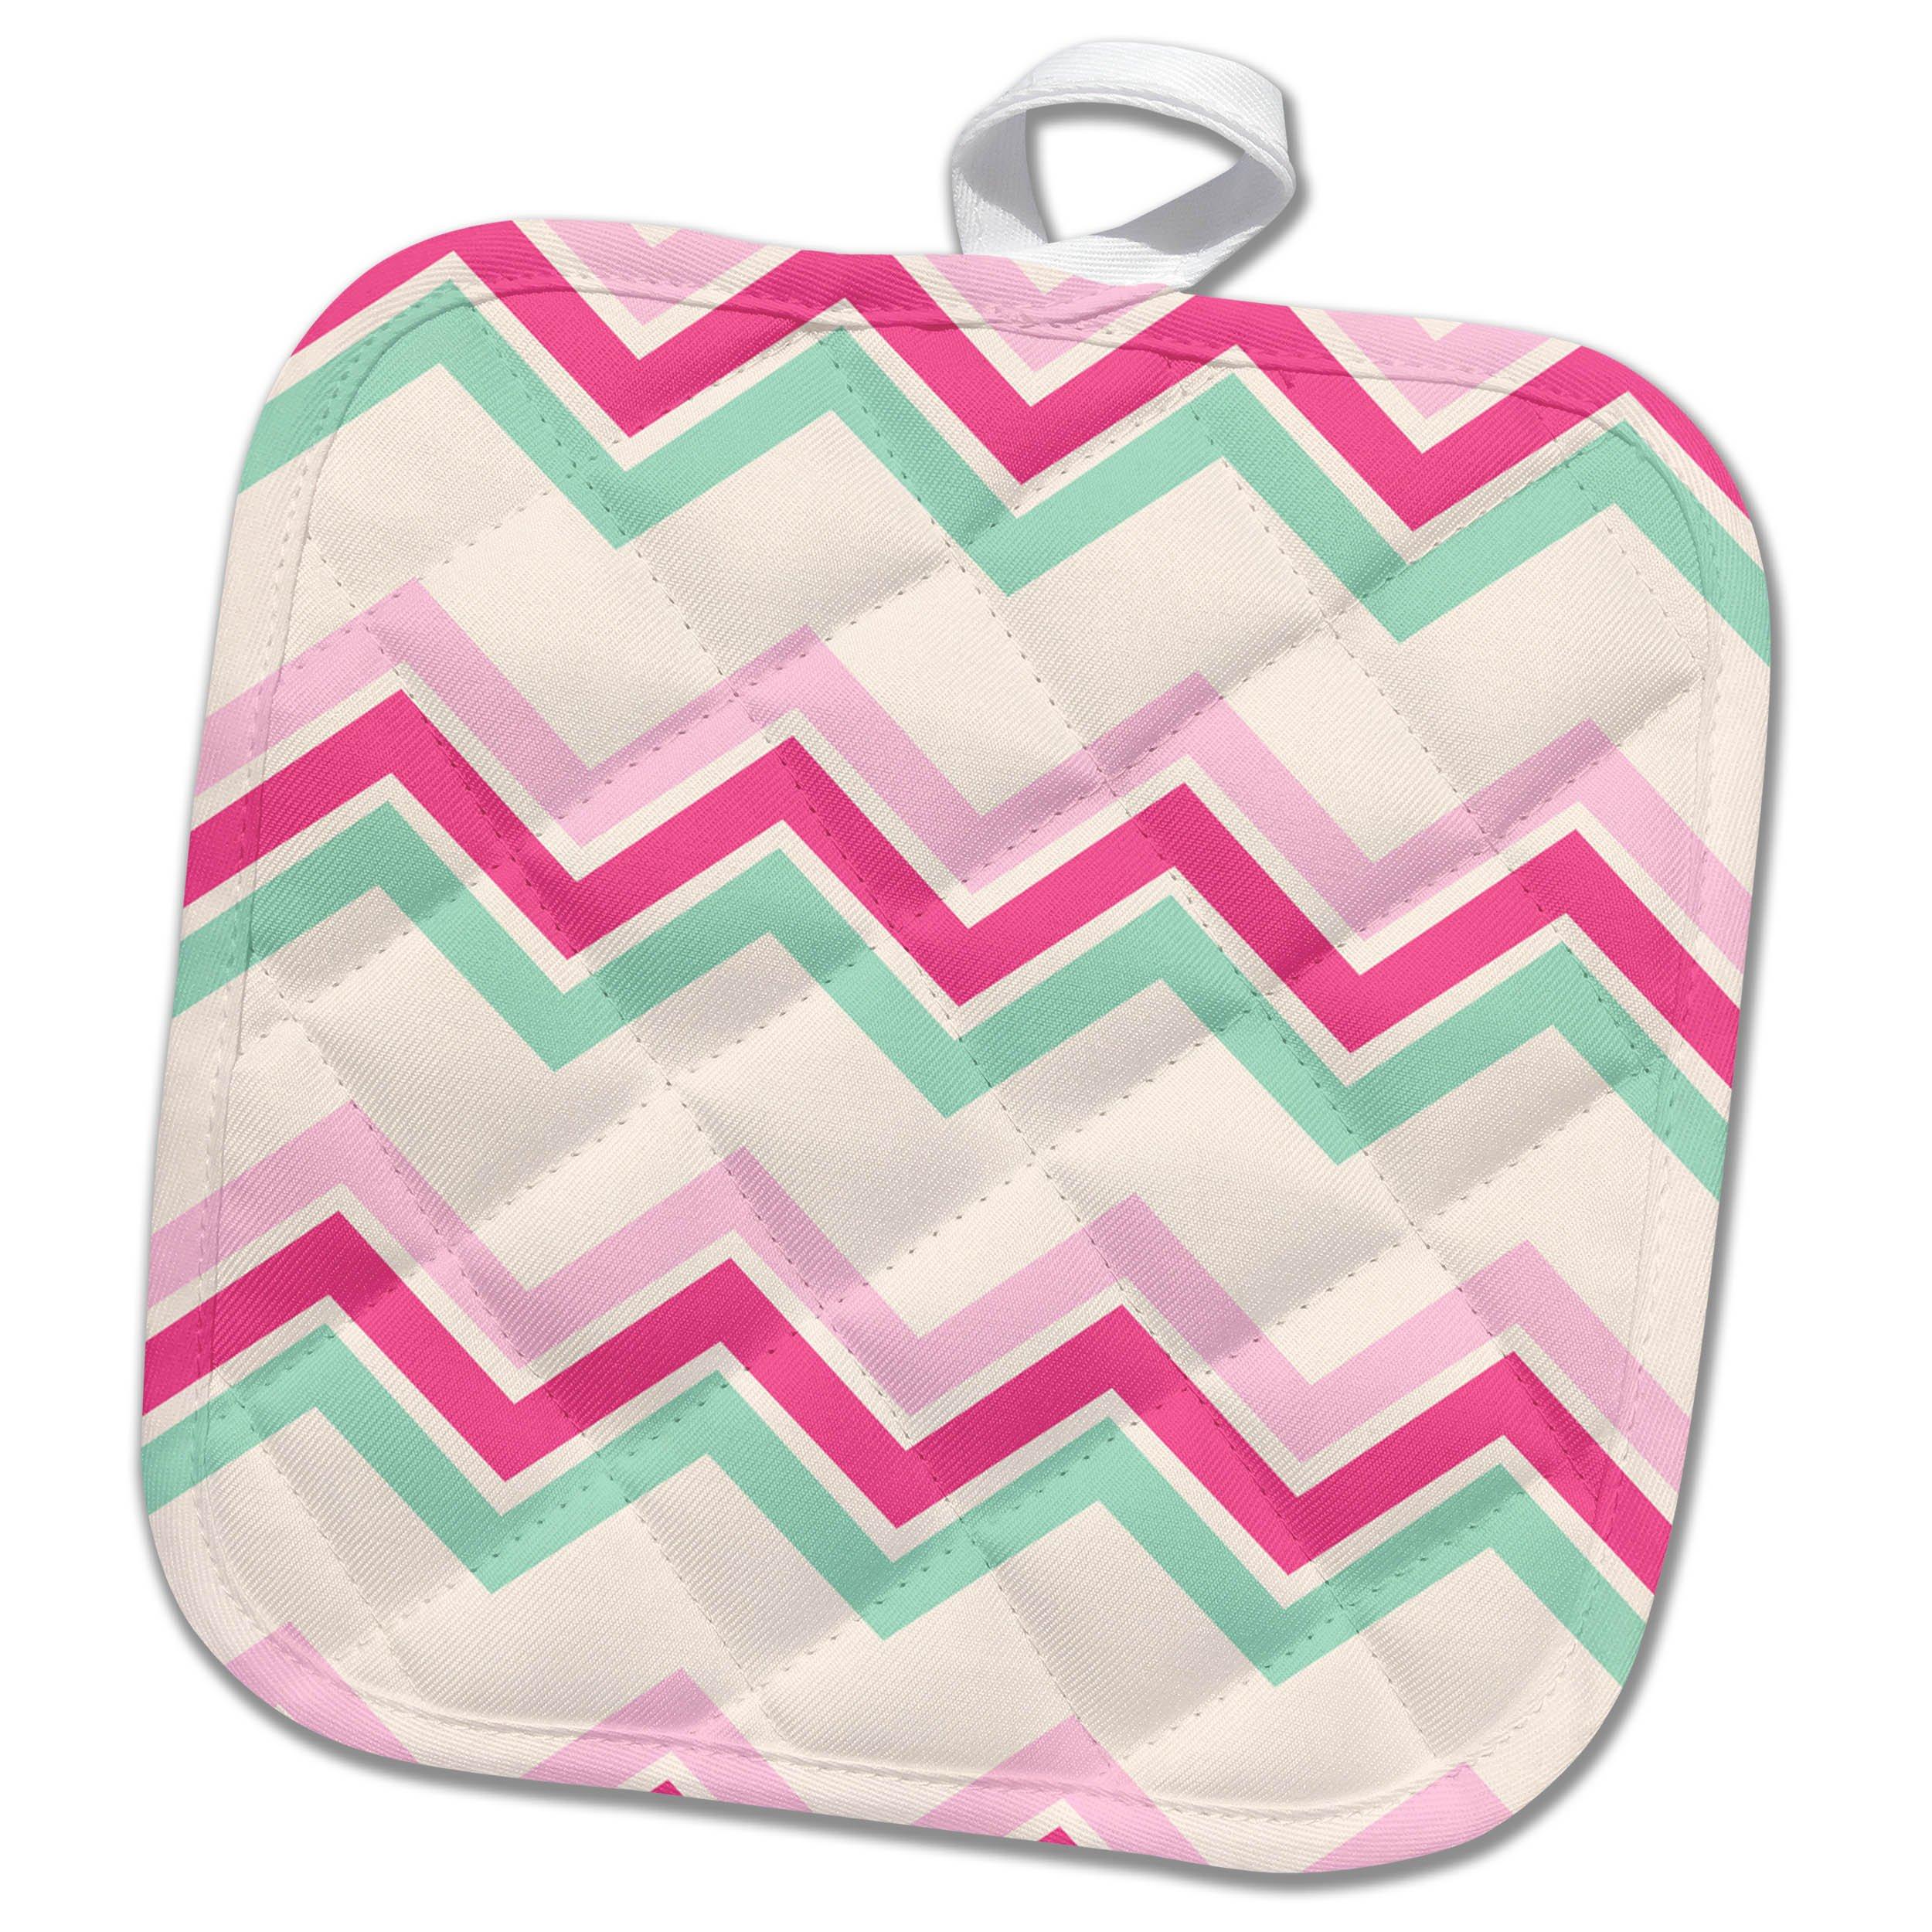 3dRose Anne Marie Baugh - Pattern - Pink, Mint Green, and White Chevron Stripes - 8x8 Potholder (phl_267457_1)